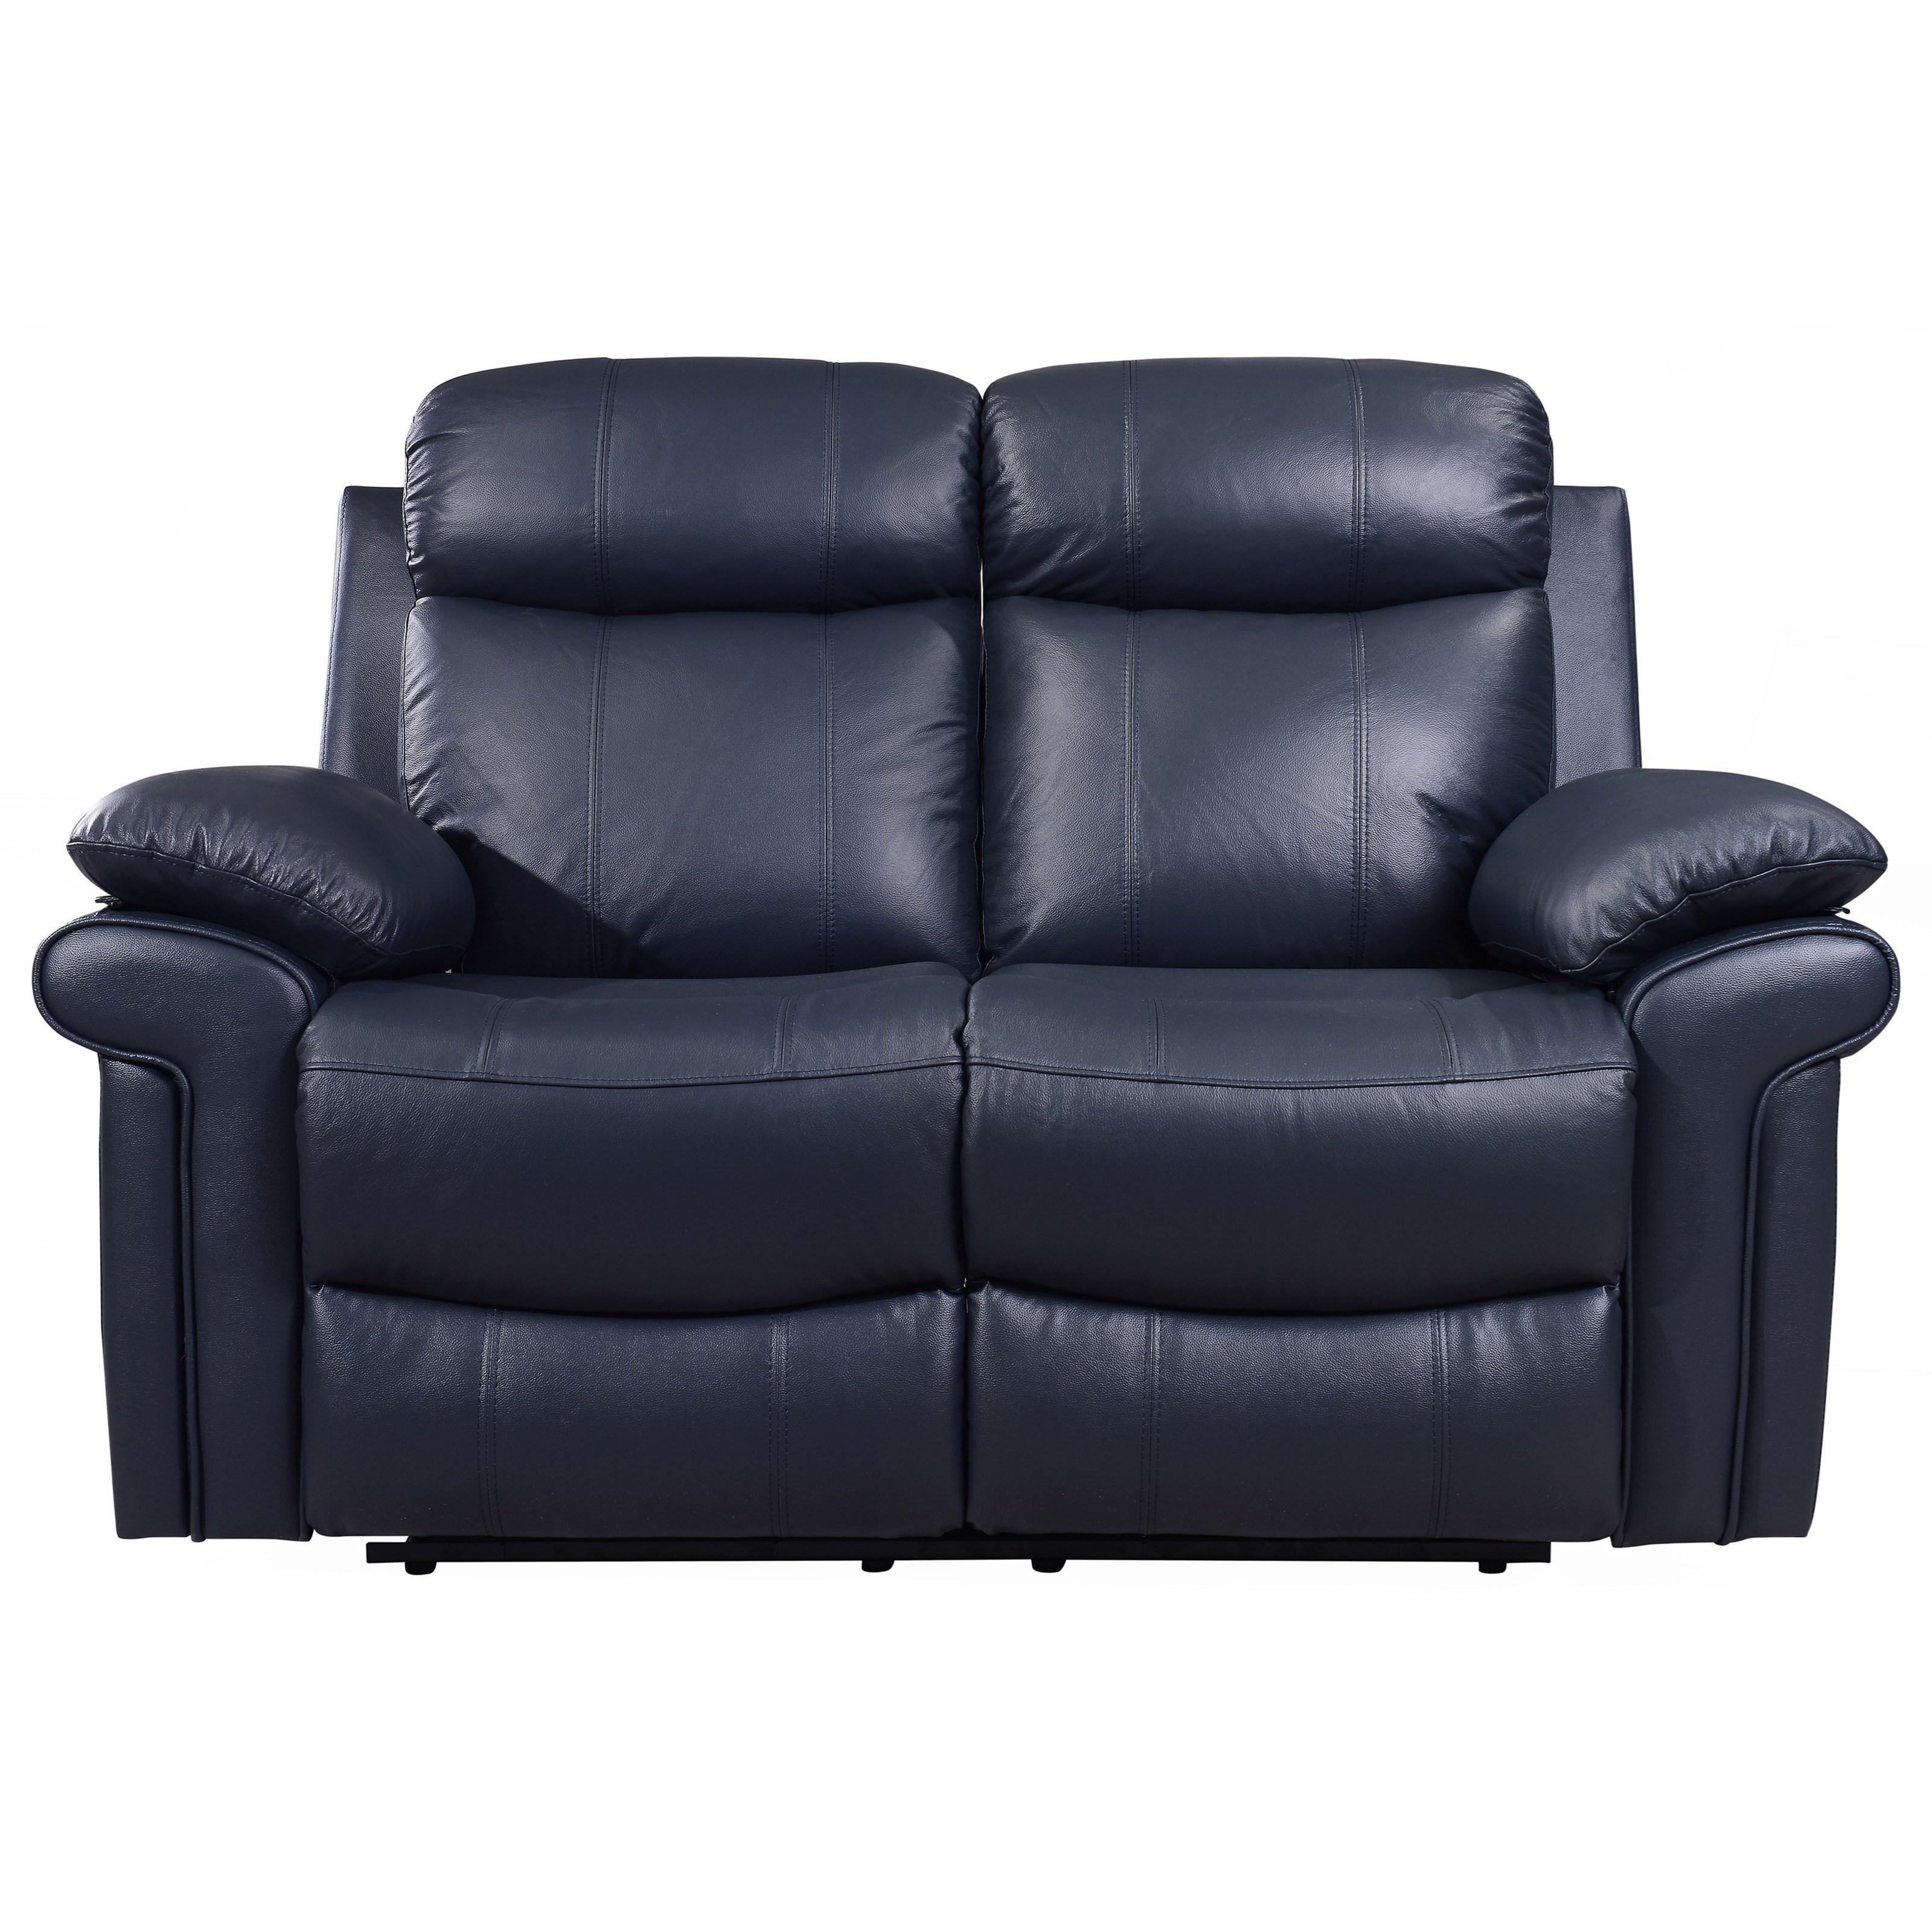 Leather Italia Usa Shae Joplin Power Reclining Leather Loveseat Lindy S Furniture Company Reclining Loveseats